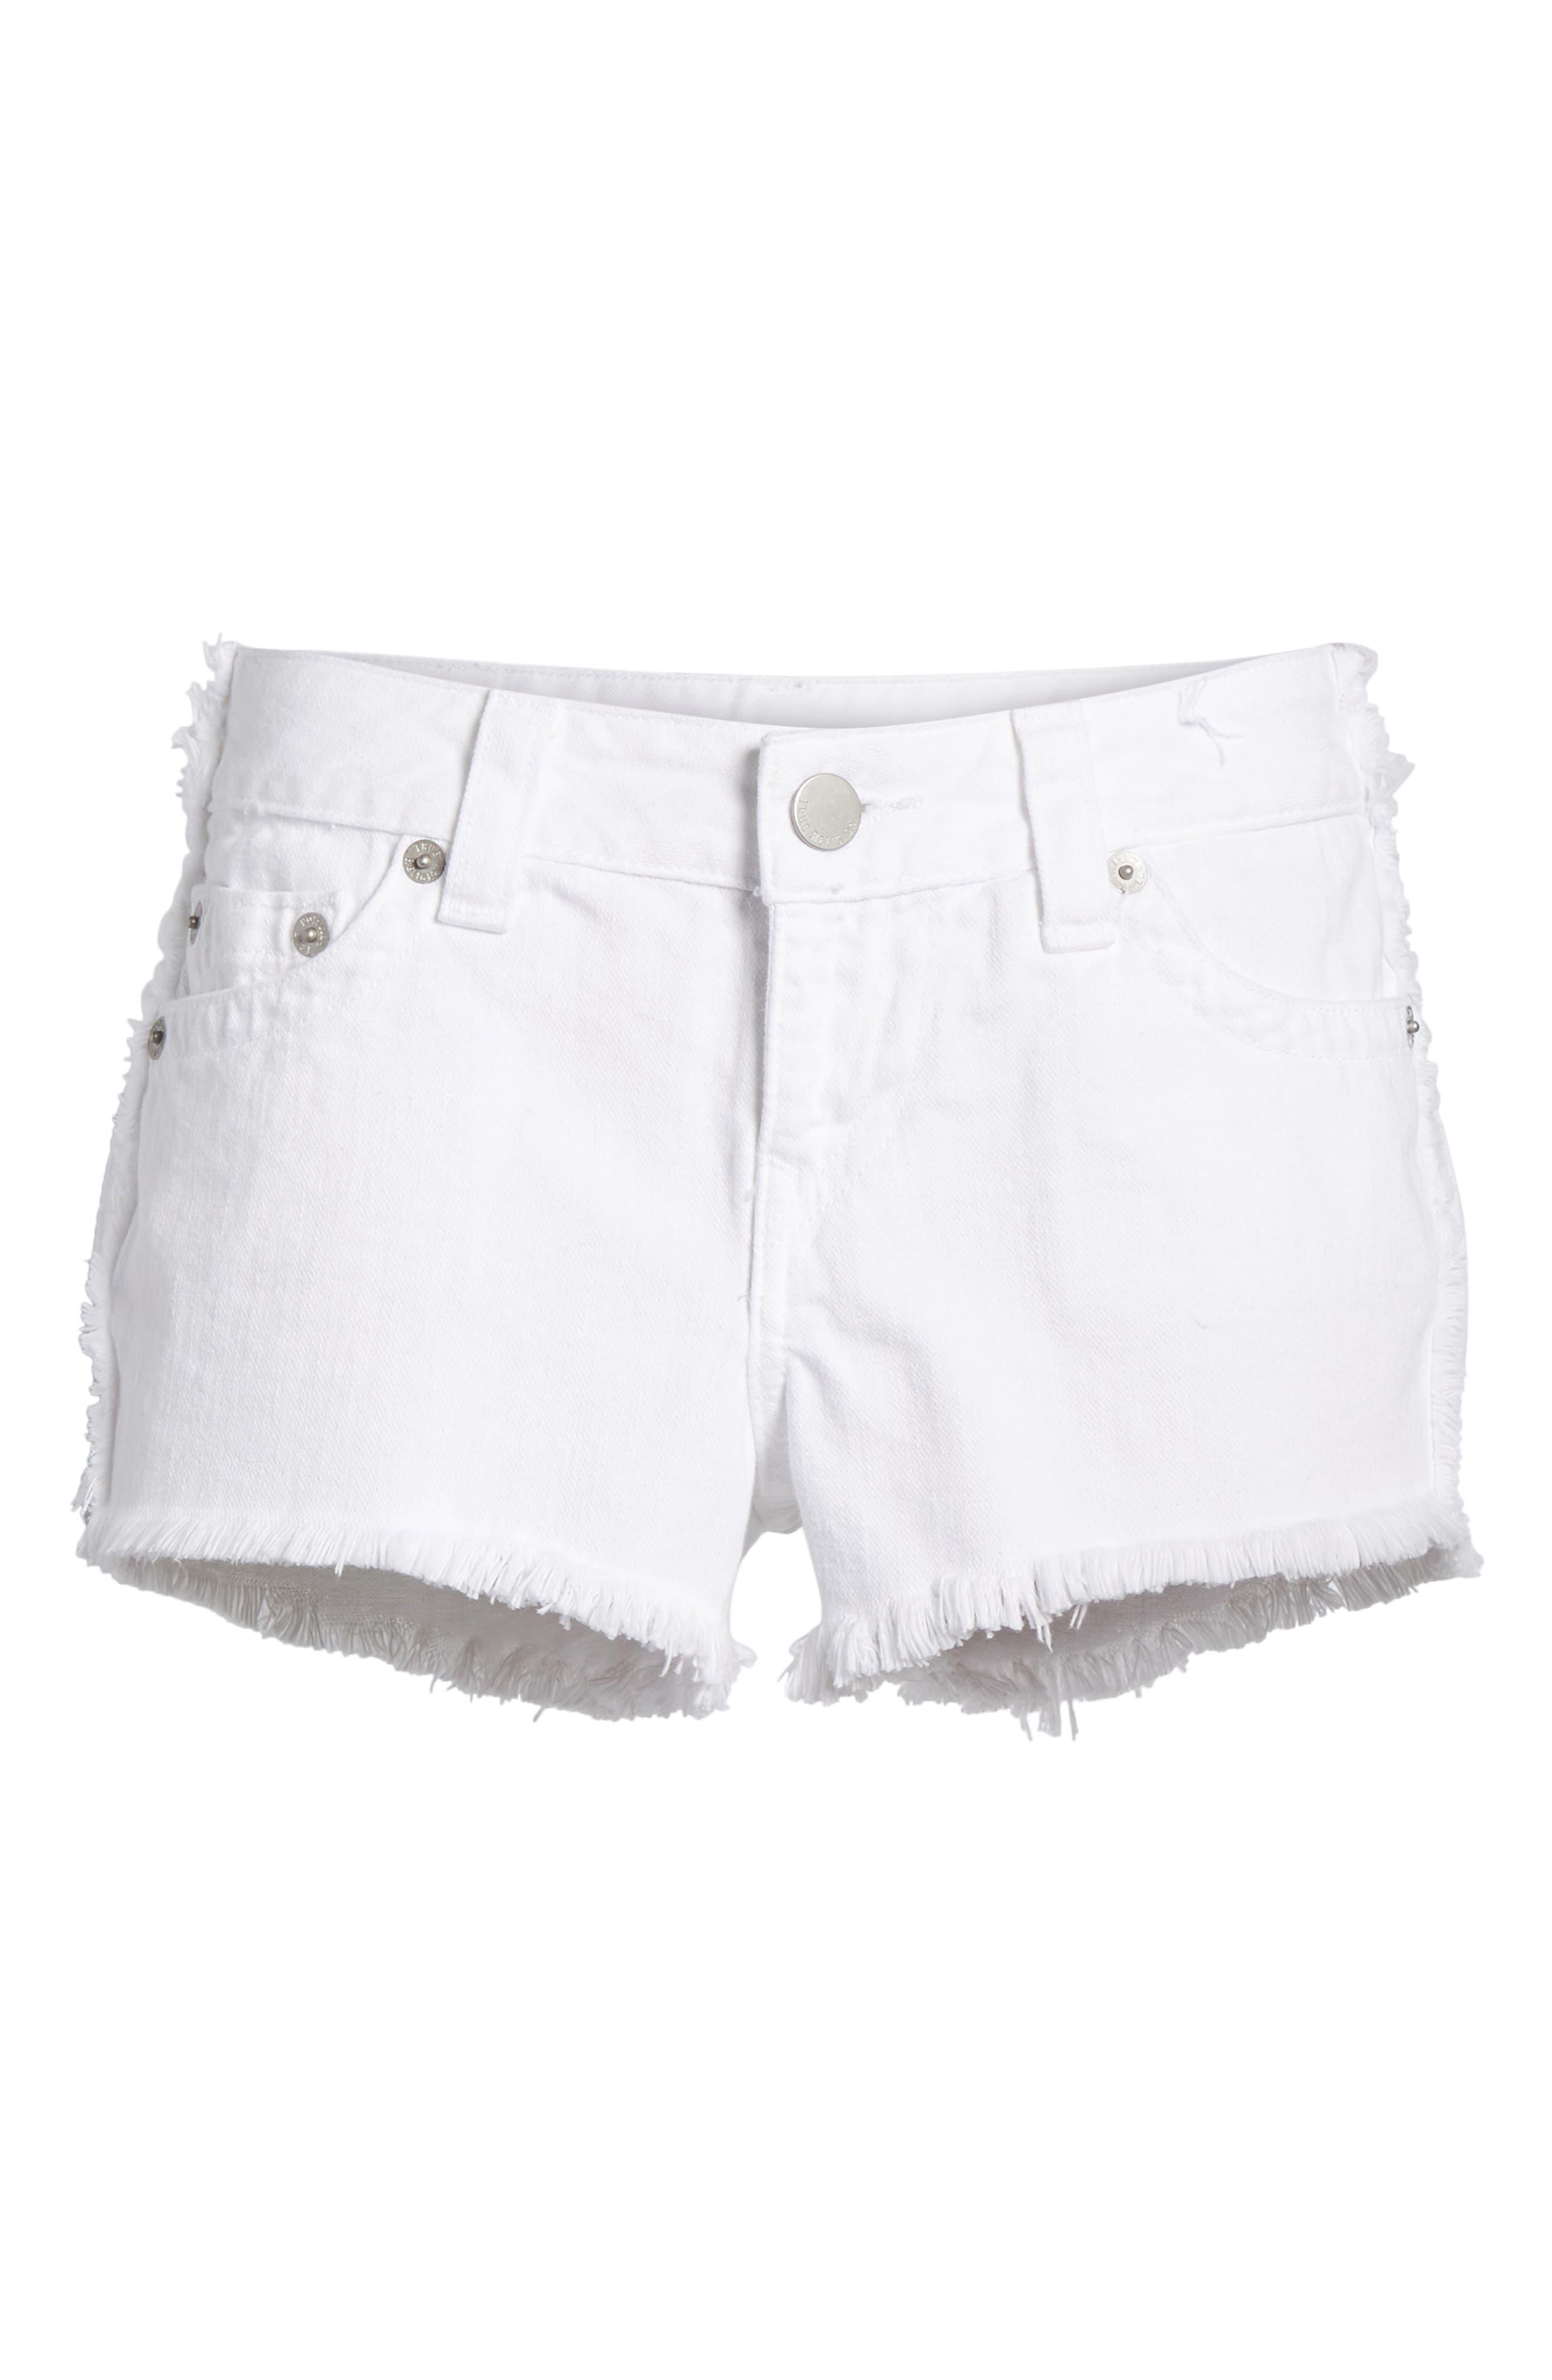 Kieras Cutoff Denim Shorts,                             Alternate thumbnail 7, color,                             Eucd Optic White